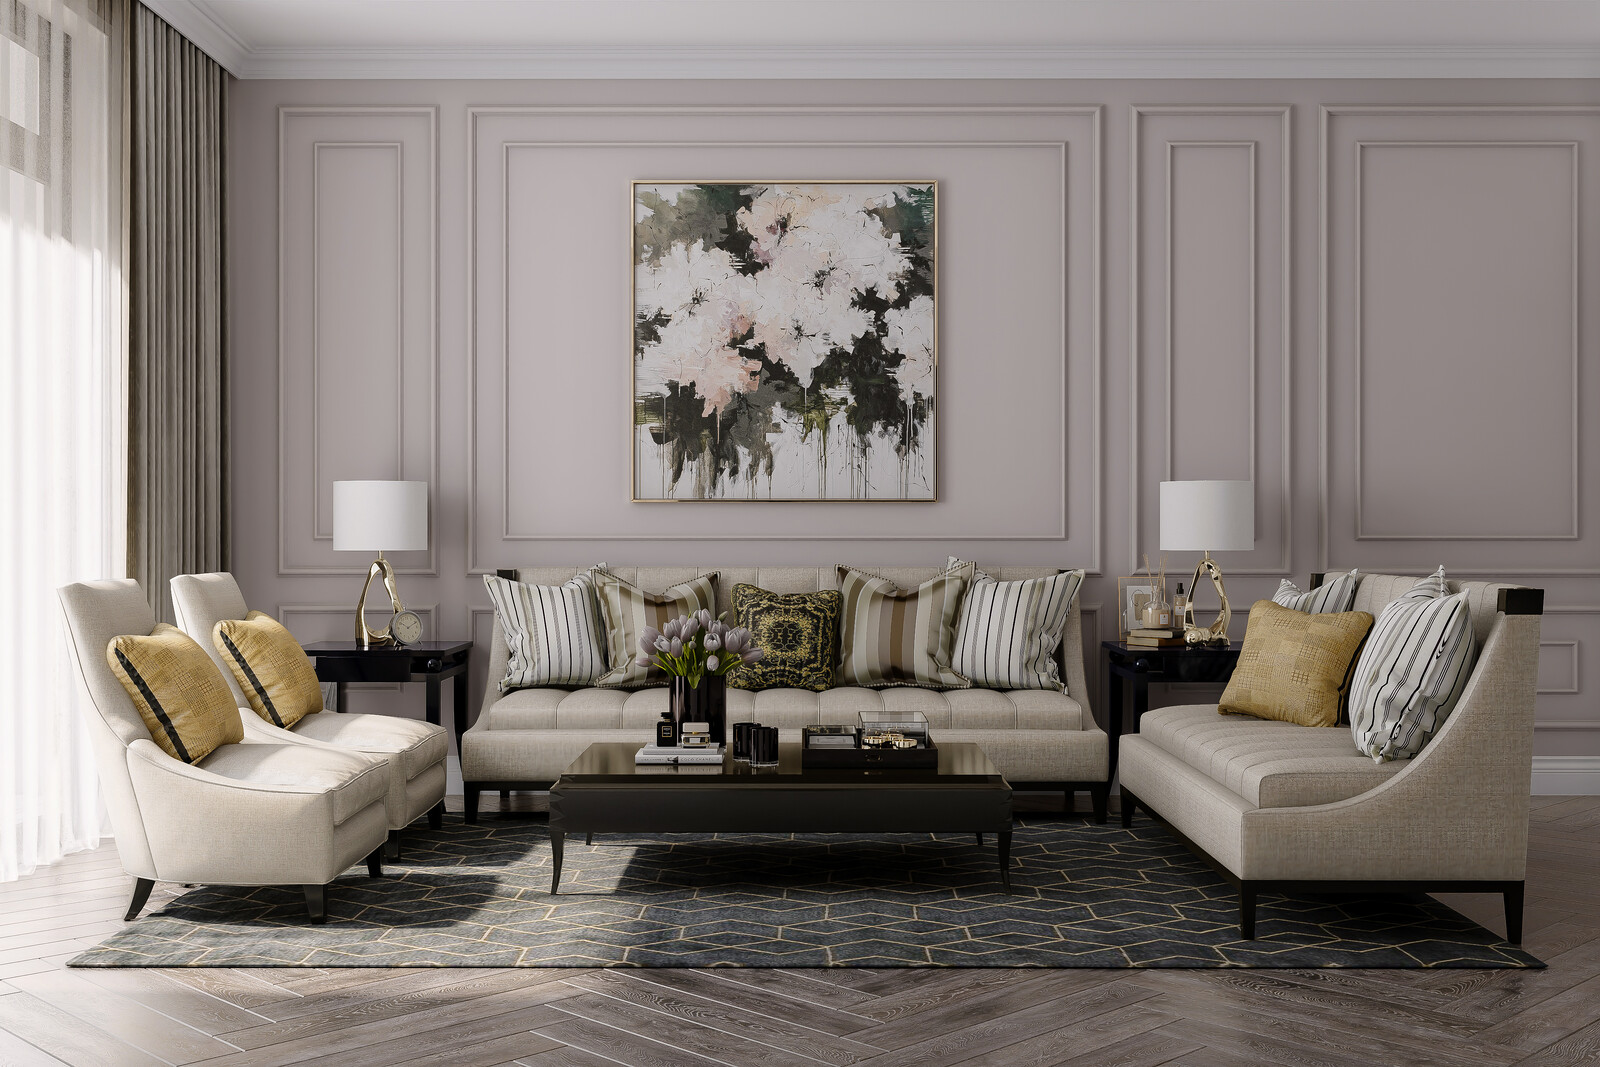 Living Room, Mid Day Light Study